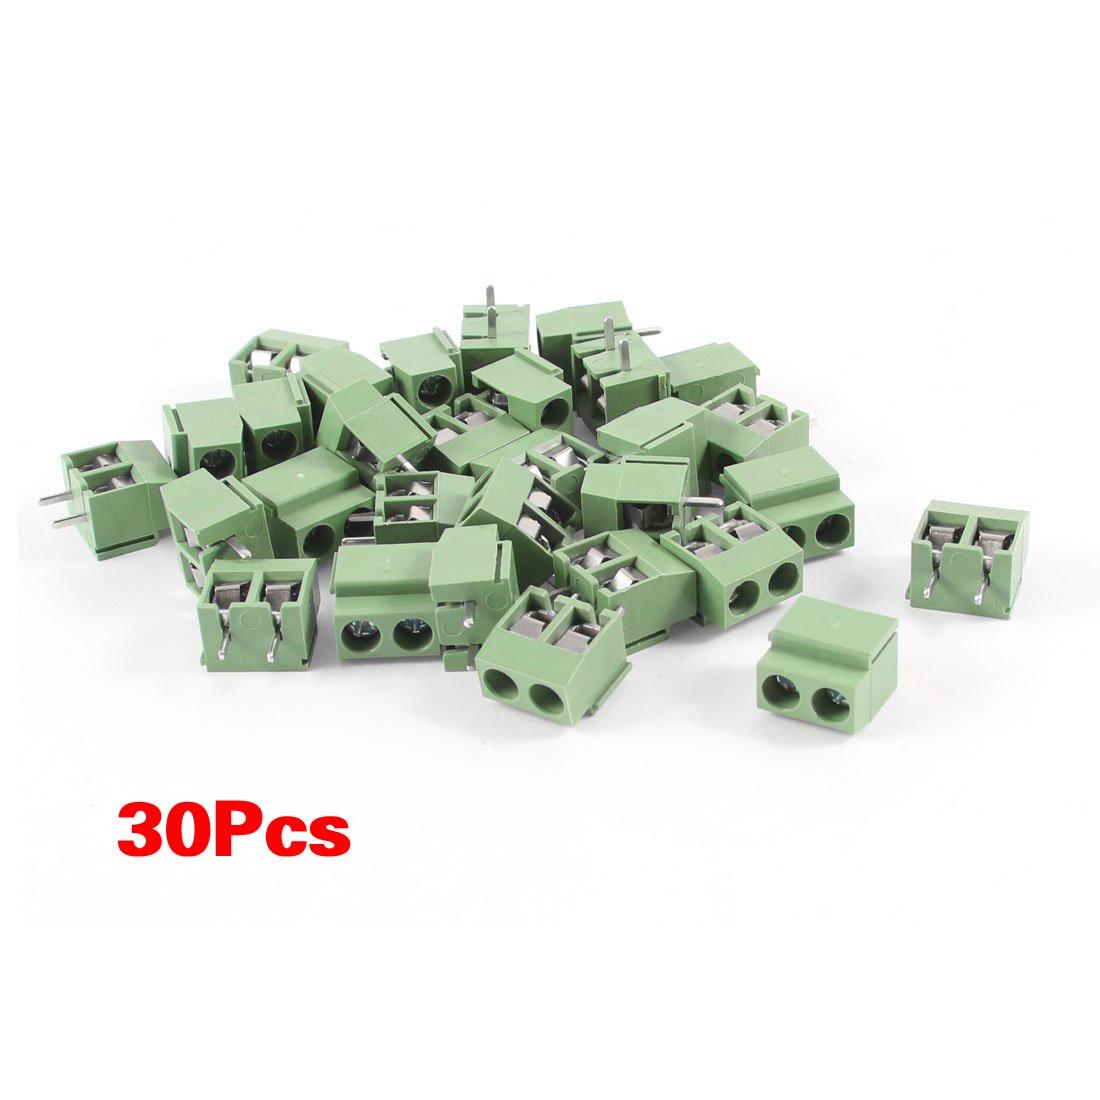 hot 30Pcs 2 Pole 5mm Pitch PCB Mount Screw Terminal Block 8A 250V